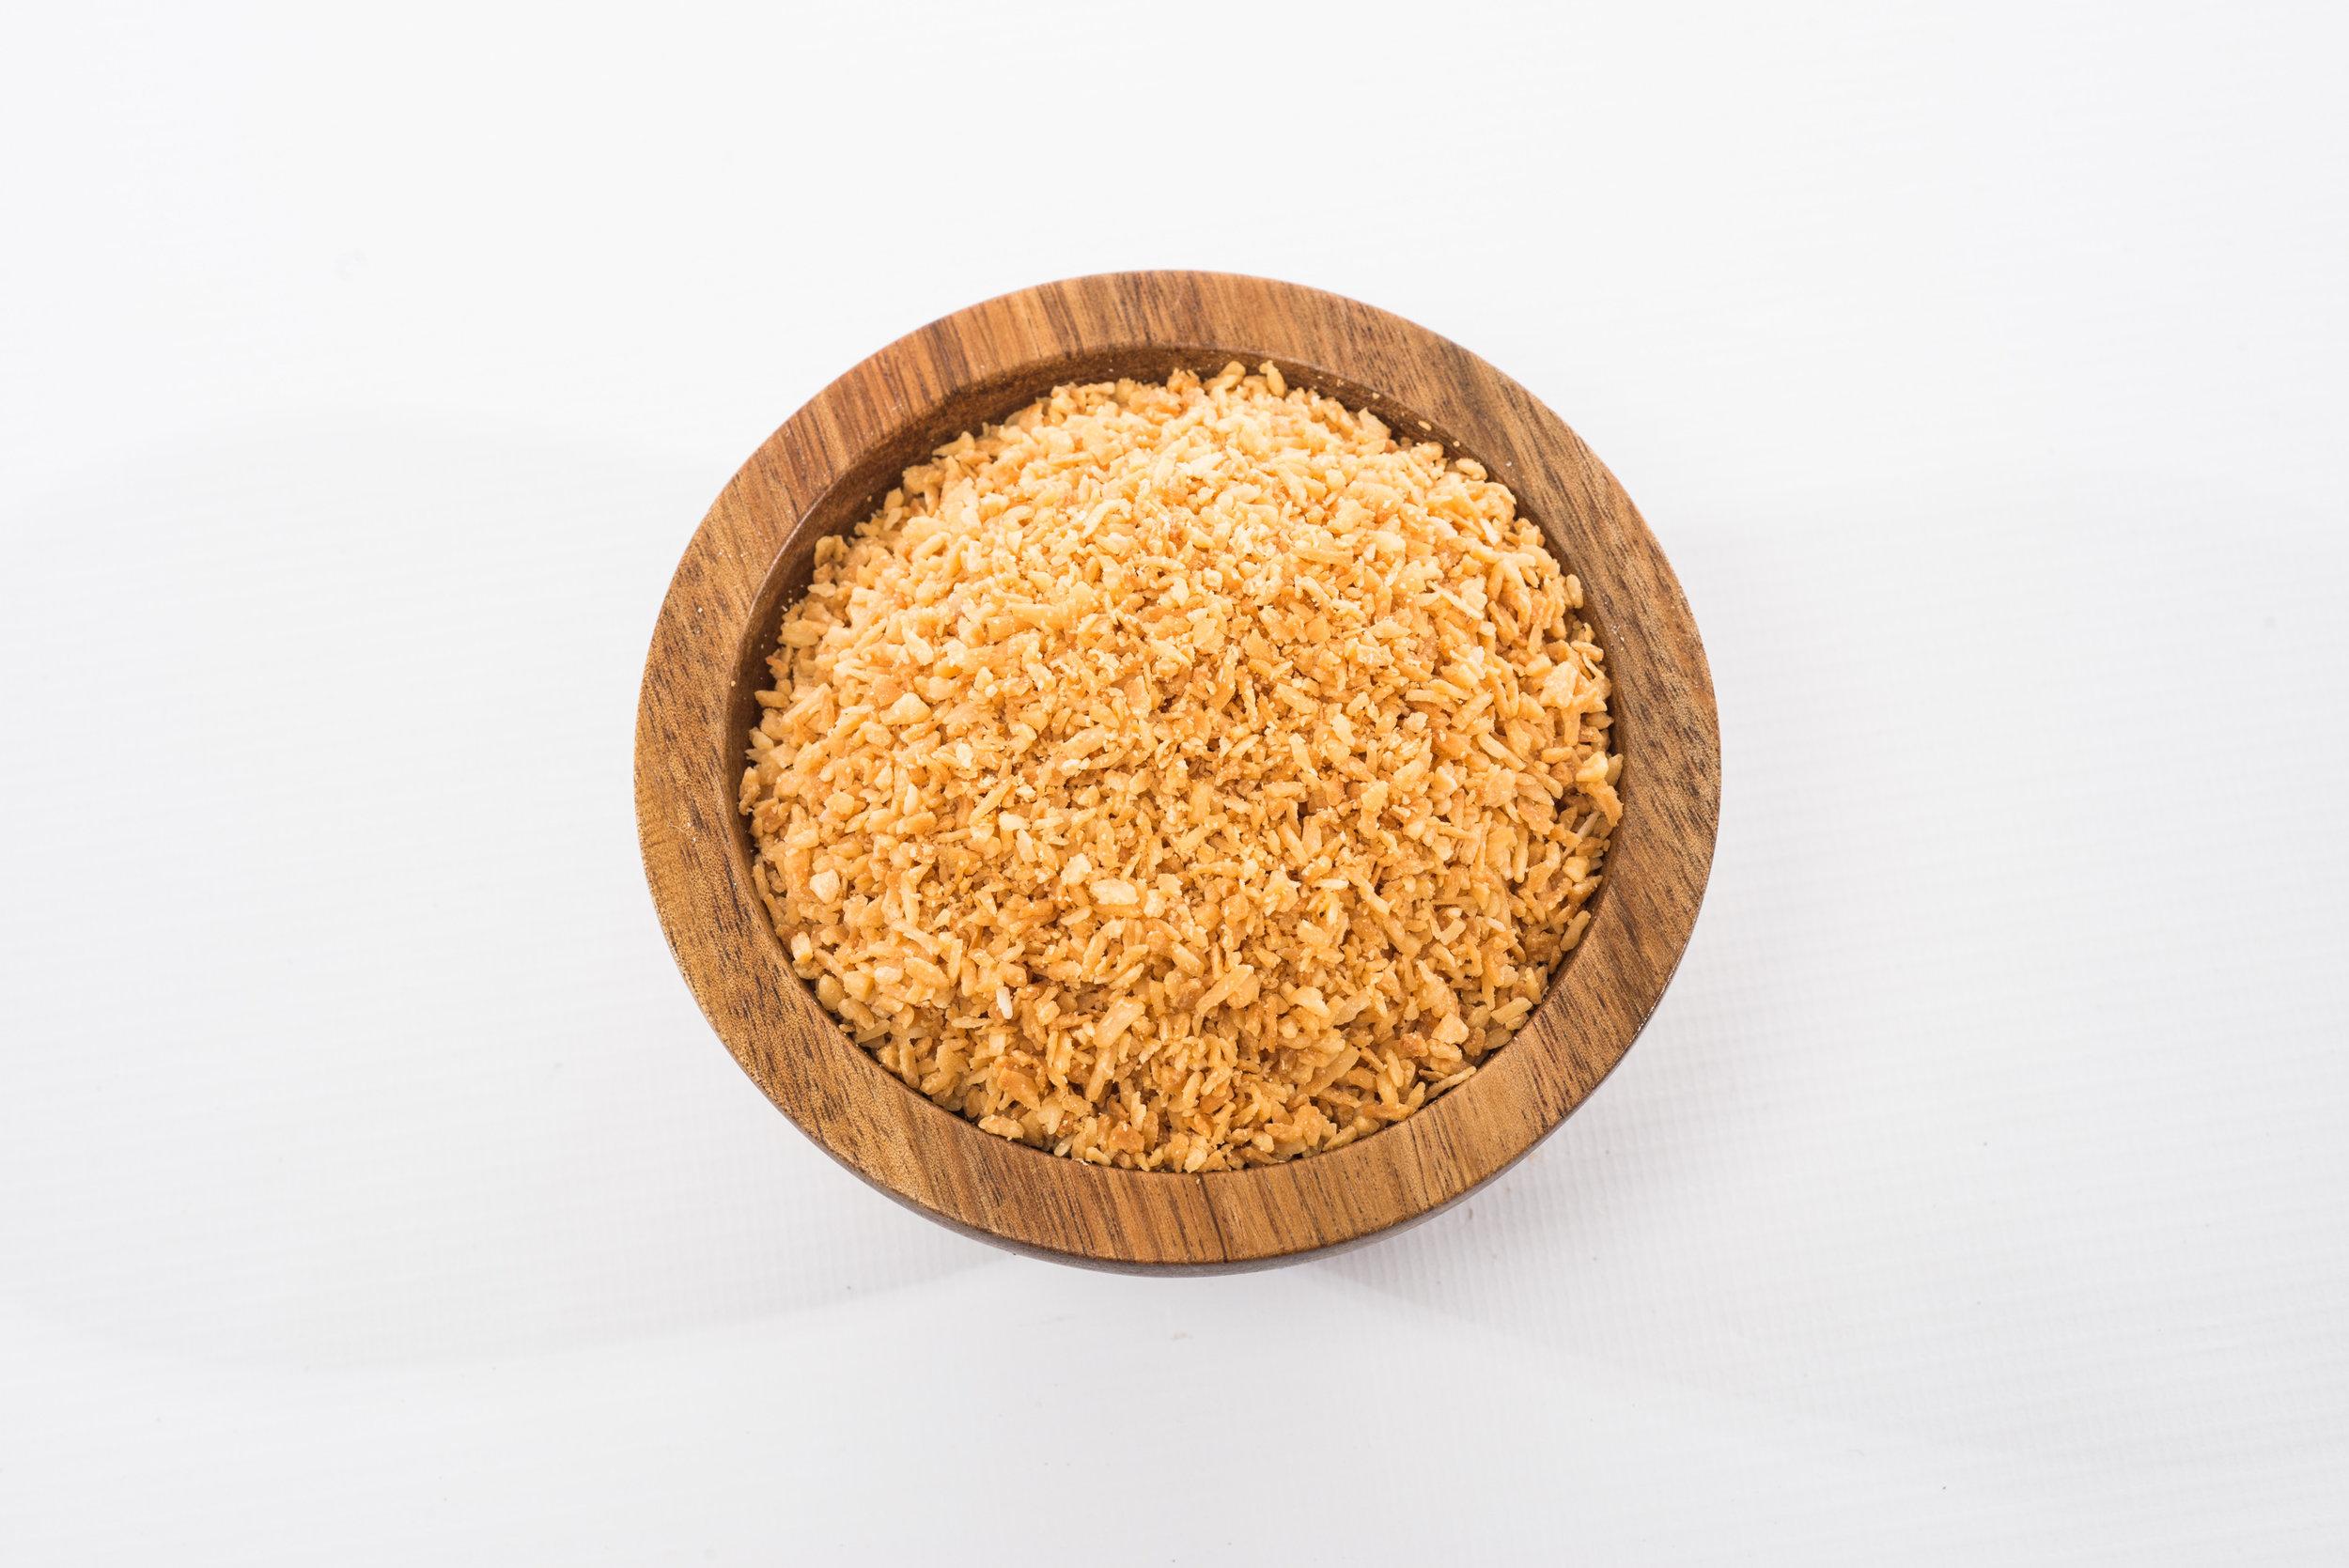 Red V Foods Toasted Sweetened Medium Flakes